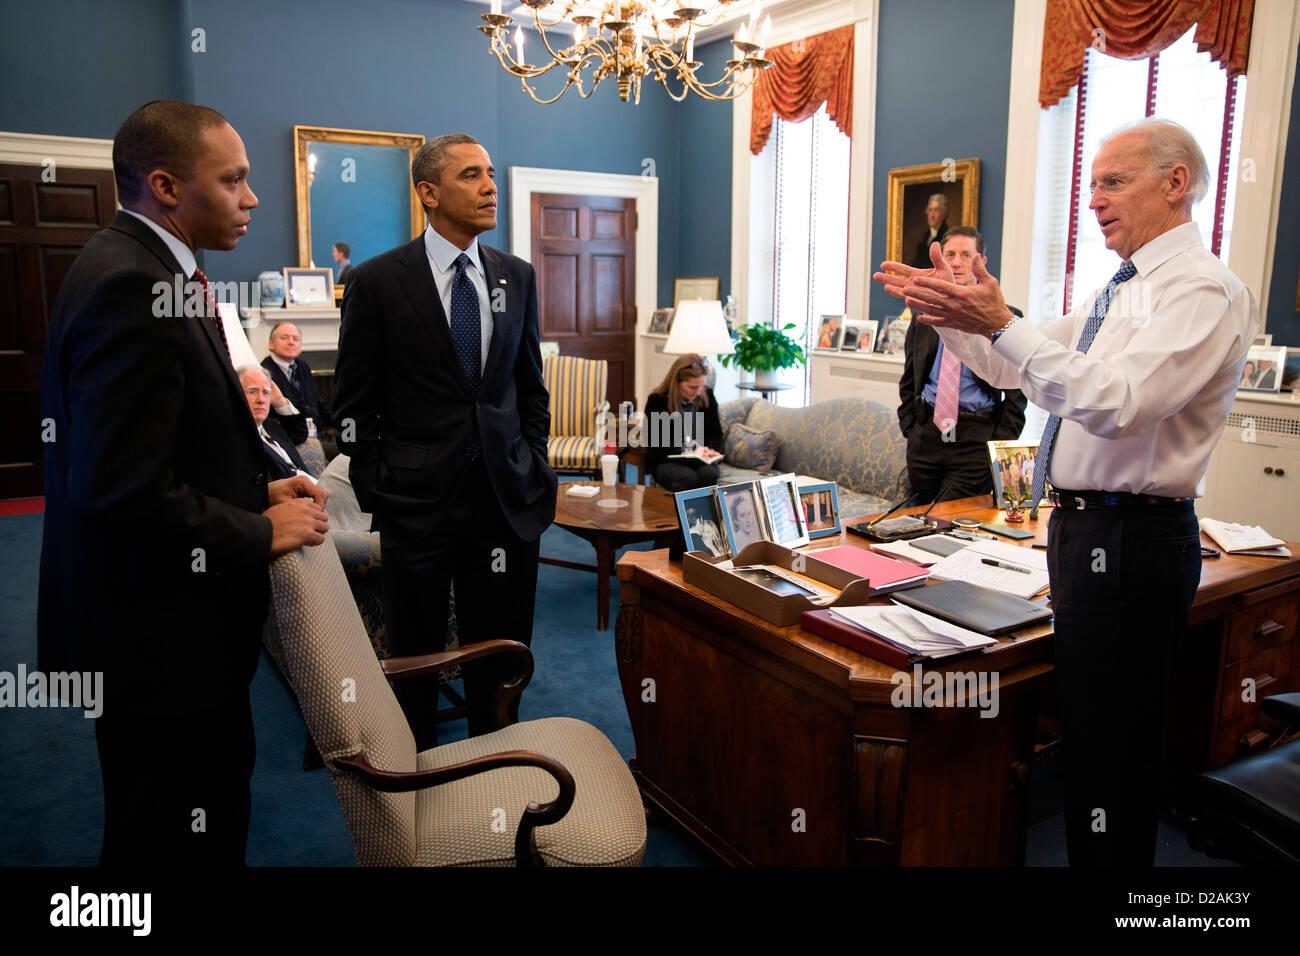 US Vice President Joe Biden talks with President Barack Obama and Rob Nabors, Assistant to the President for Legislative Stock Photo